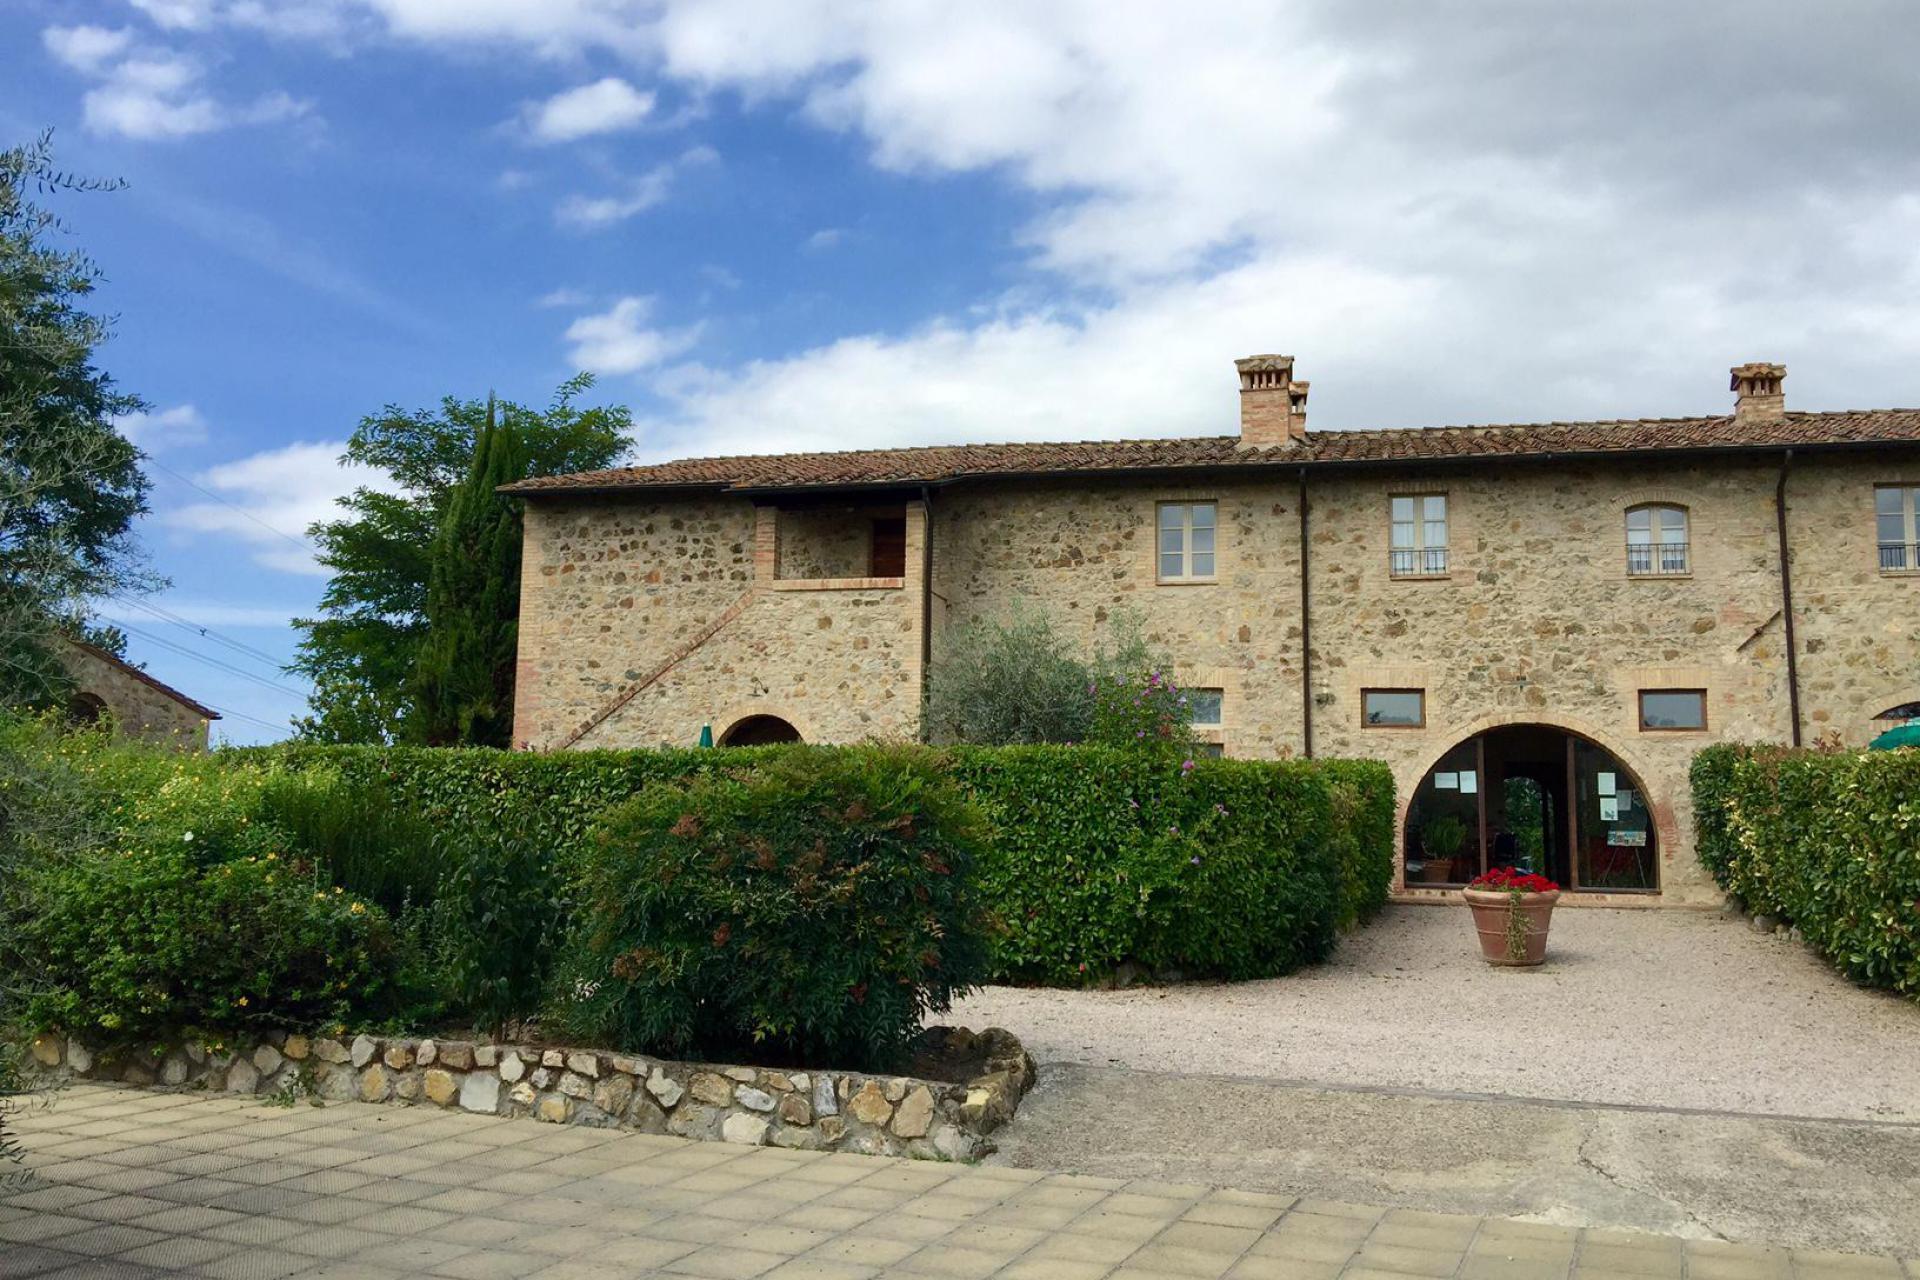 Agriturismo Toscana Agriturismo per bambini, posizione centrale in Toscana